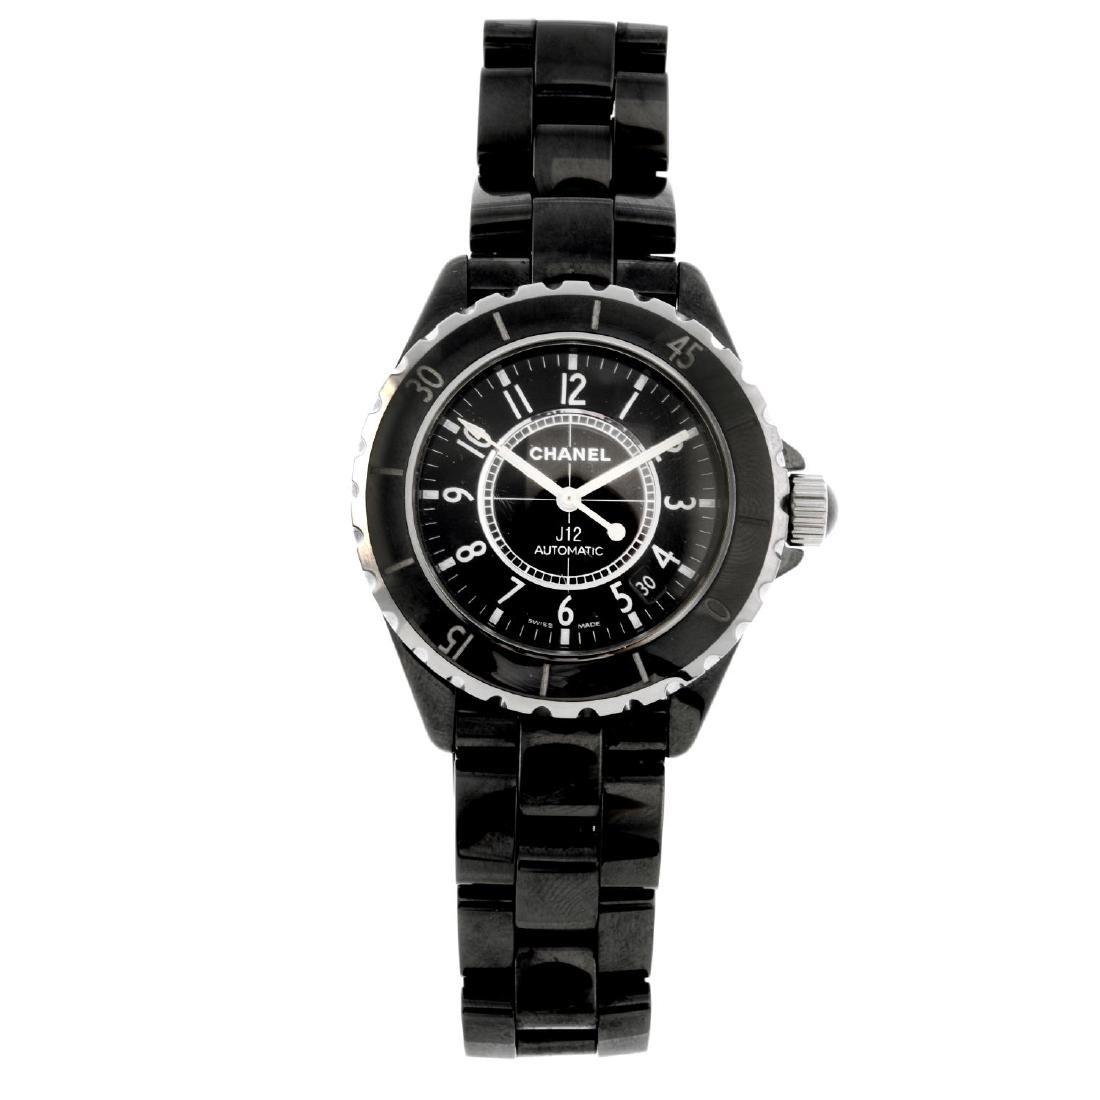 CHANEL - a J12 bracelet watch. Black ceramic case with